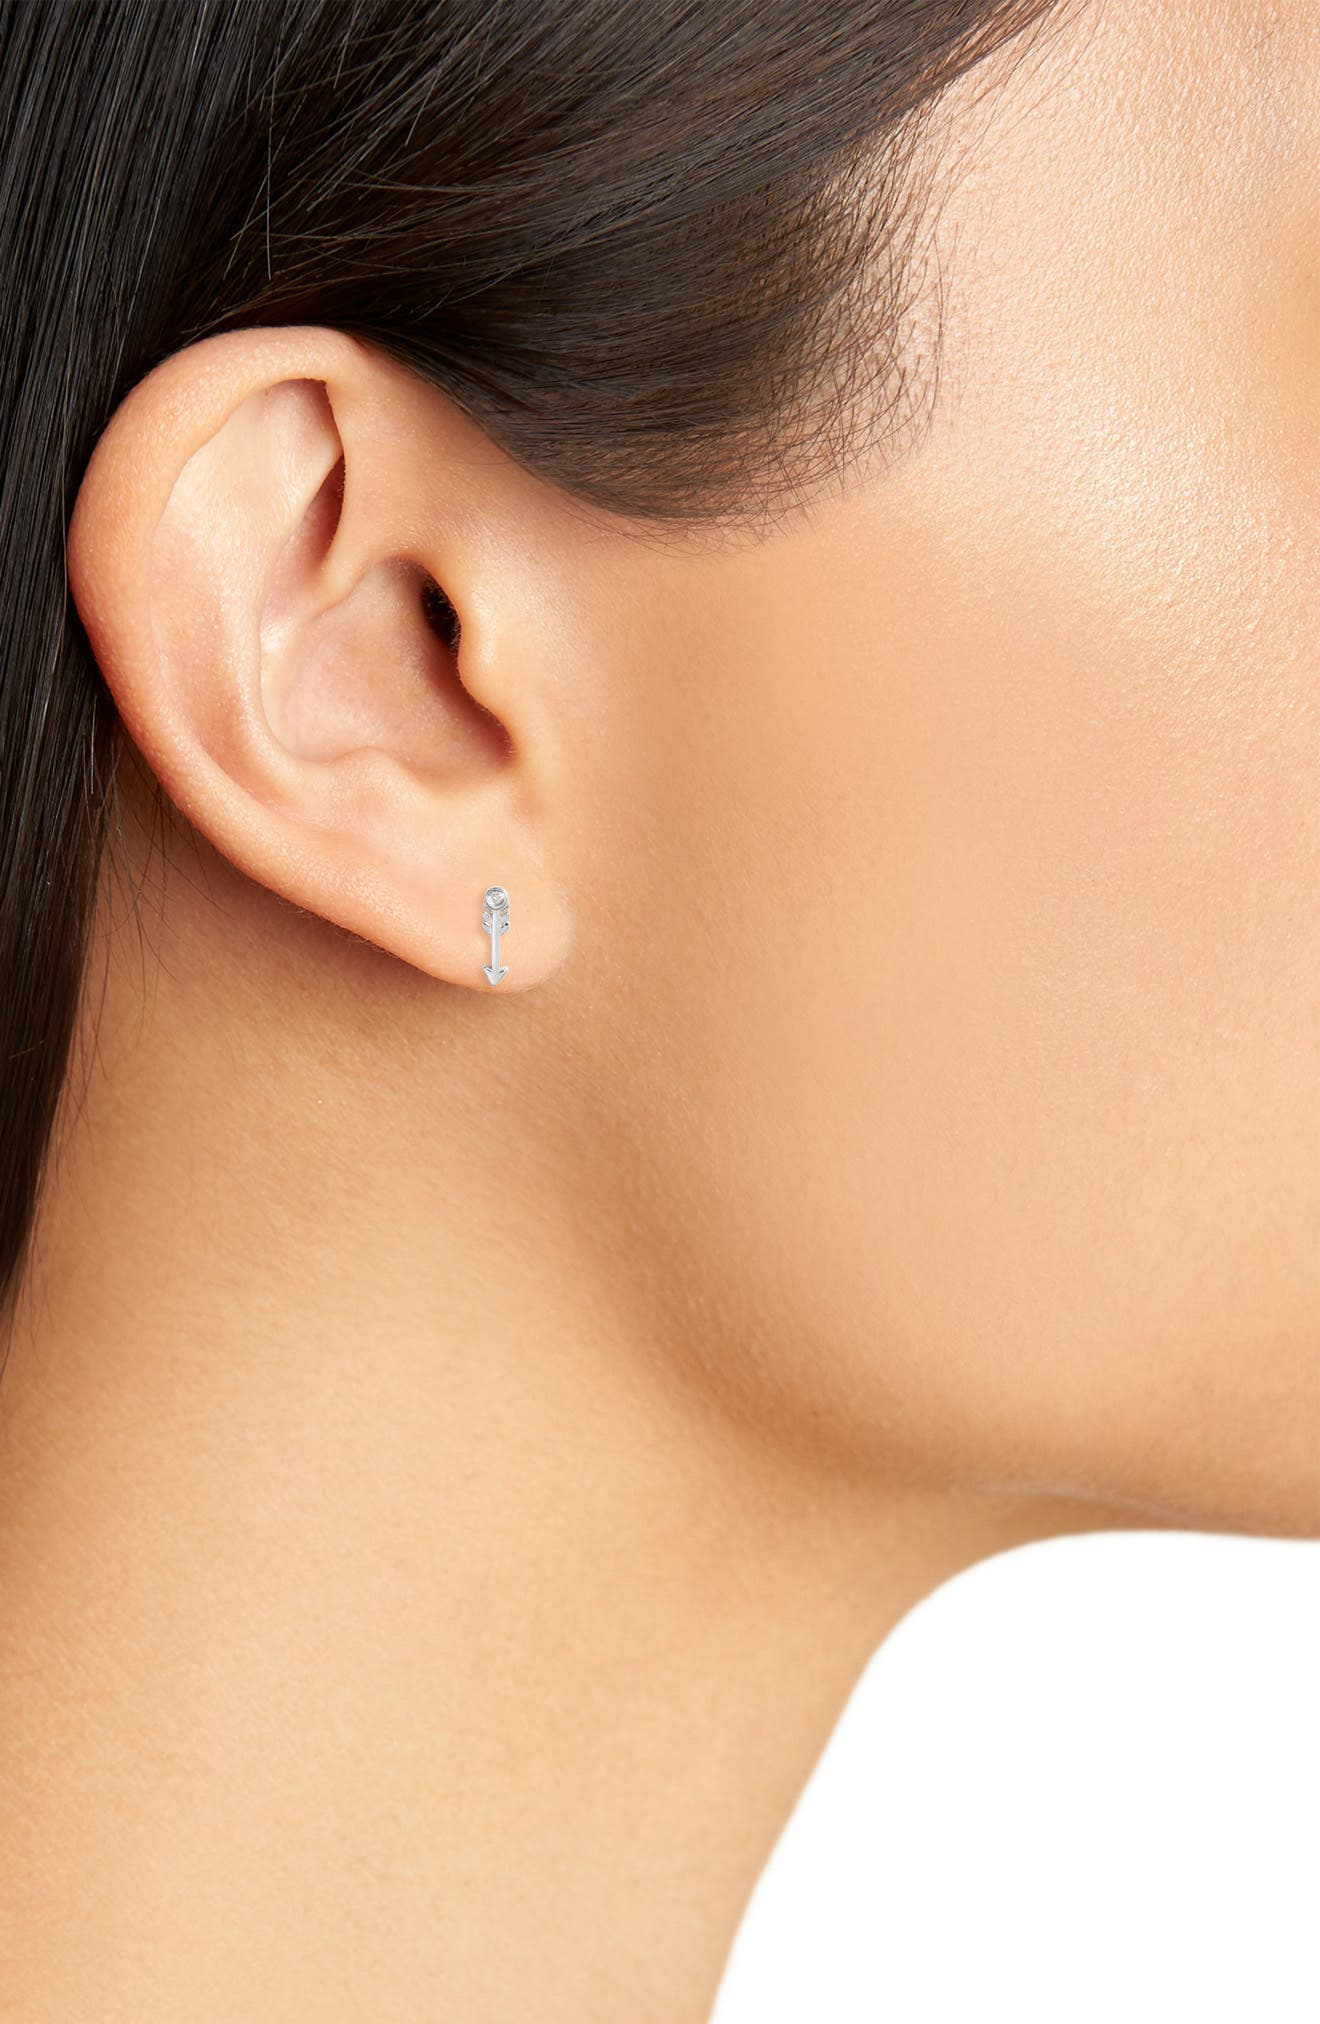 Diamond Arrow Stud Earrings,                             Alternate thumbnail 3, color,                             SILVER